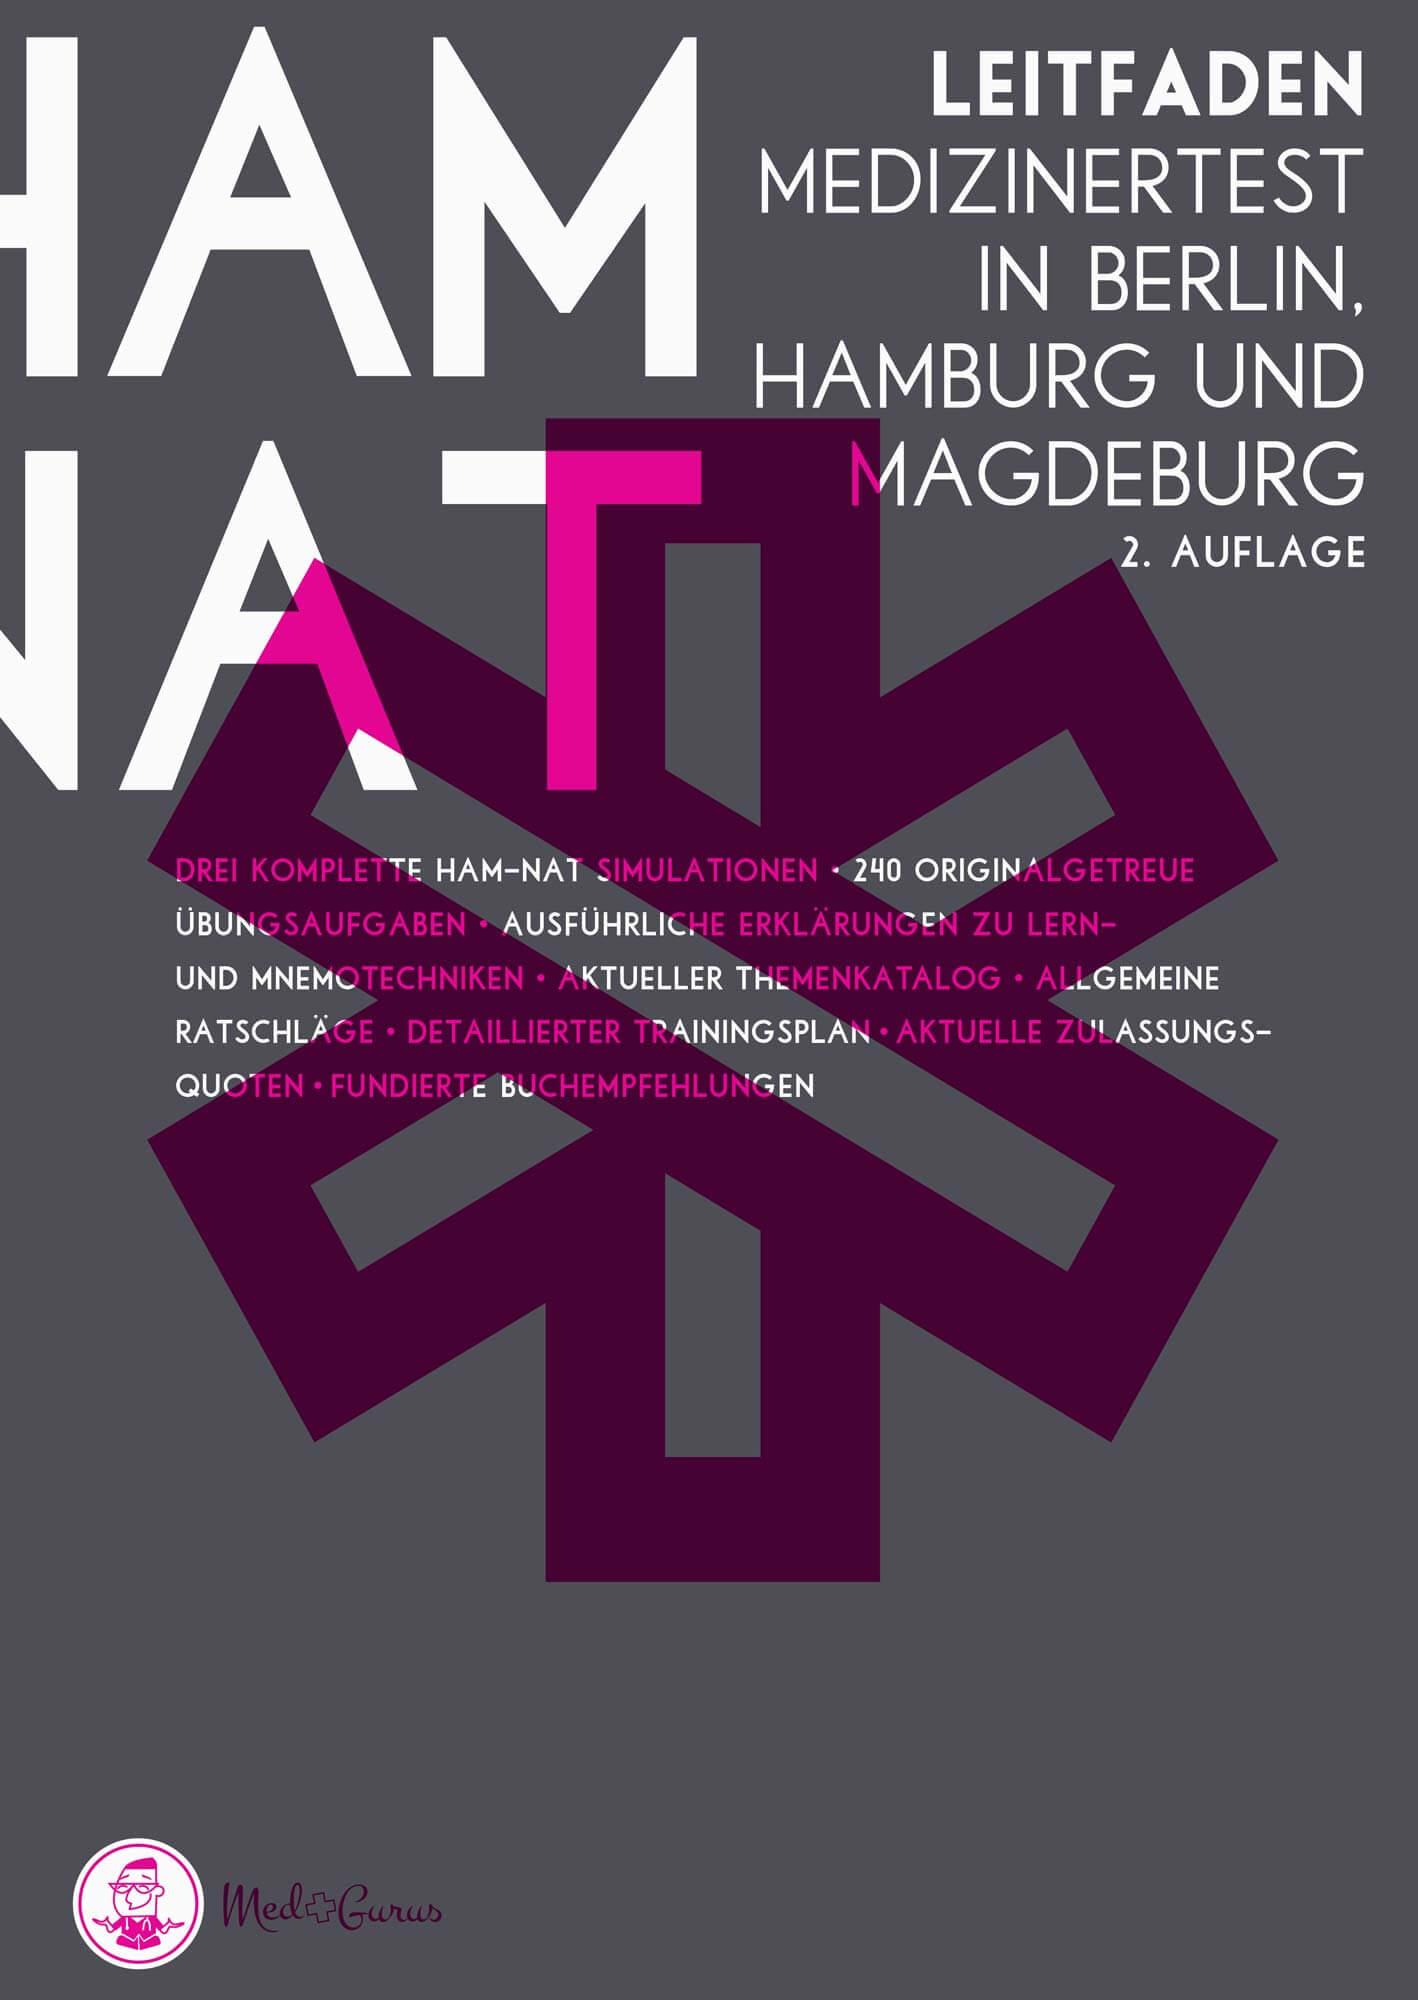 HAM-Nat Leitfaden 2019 / 2020 Berlin, Hamburg Magdeburg Cover